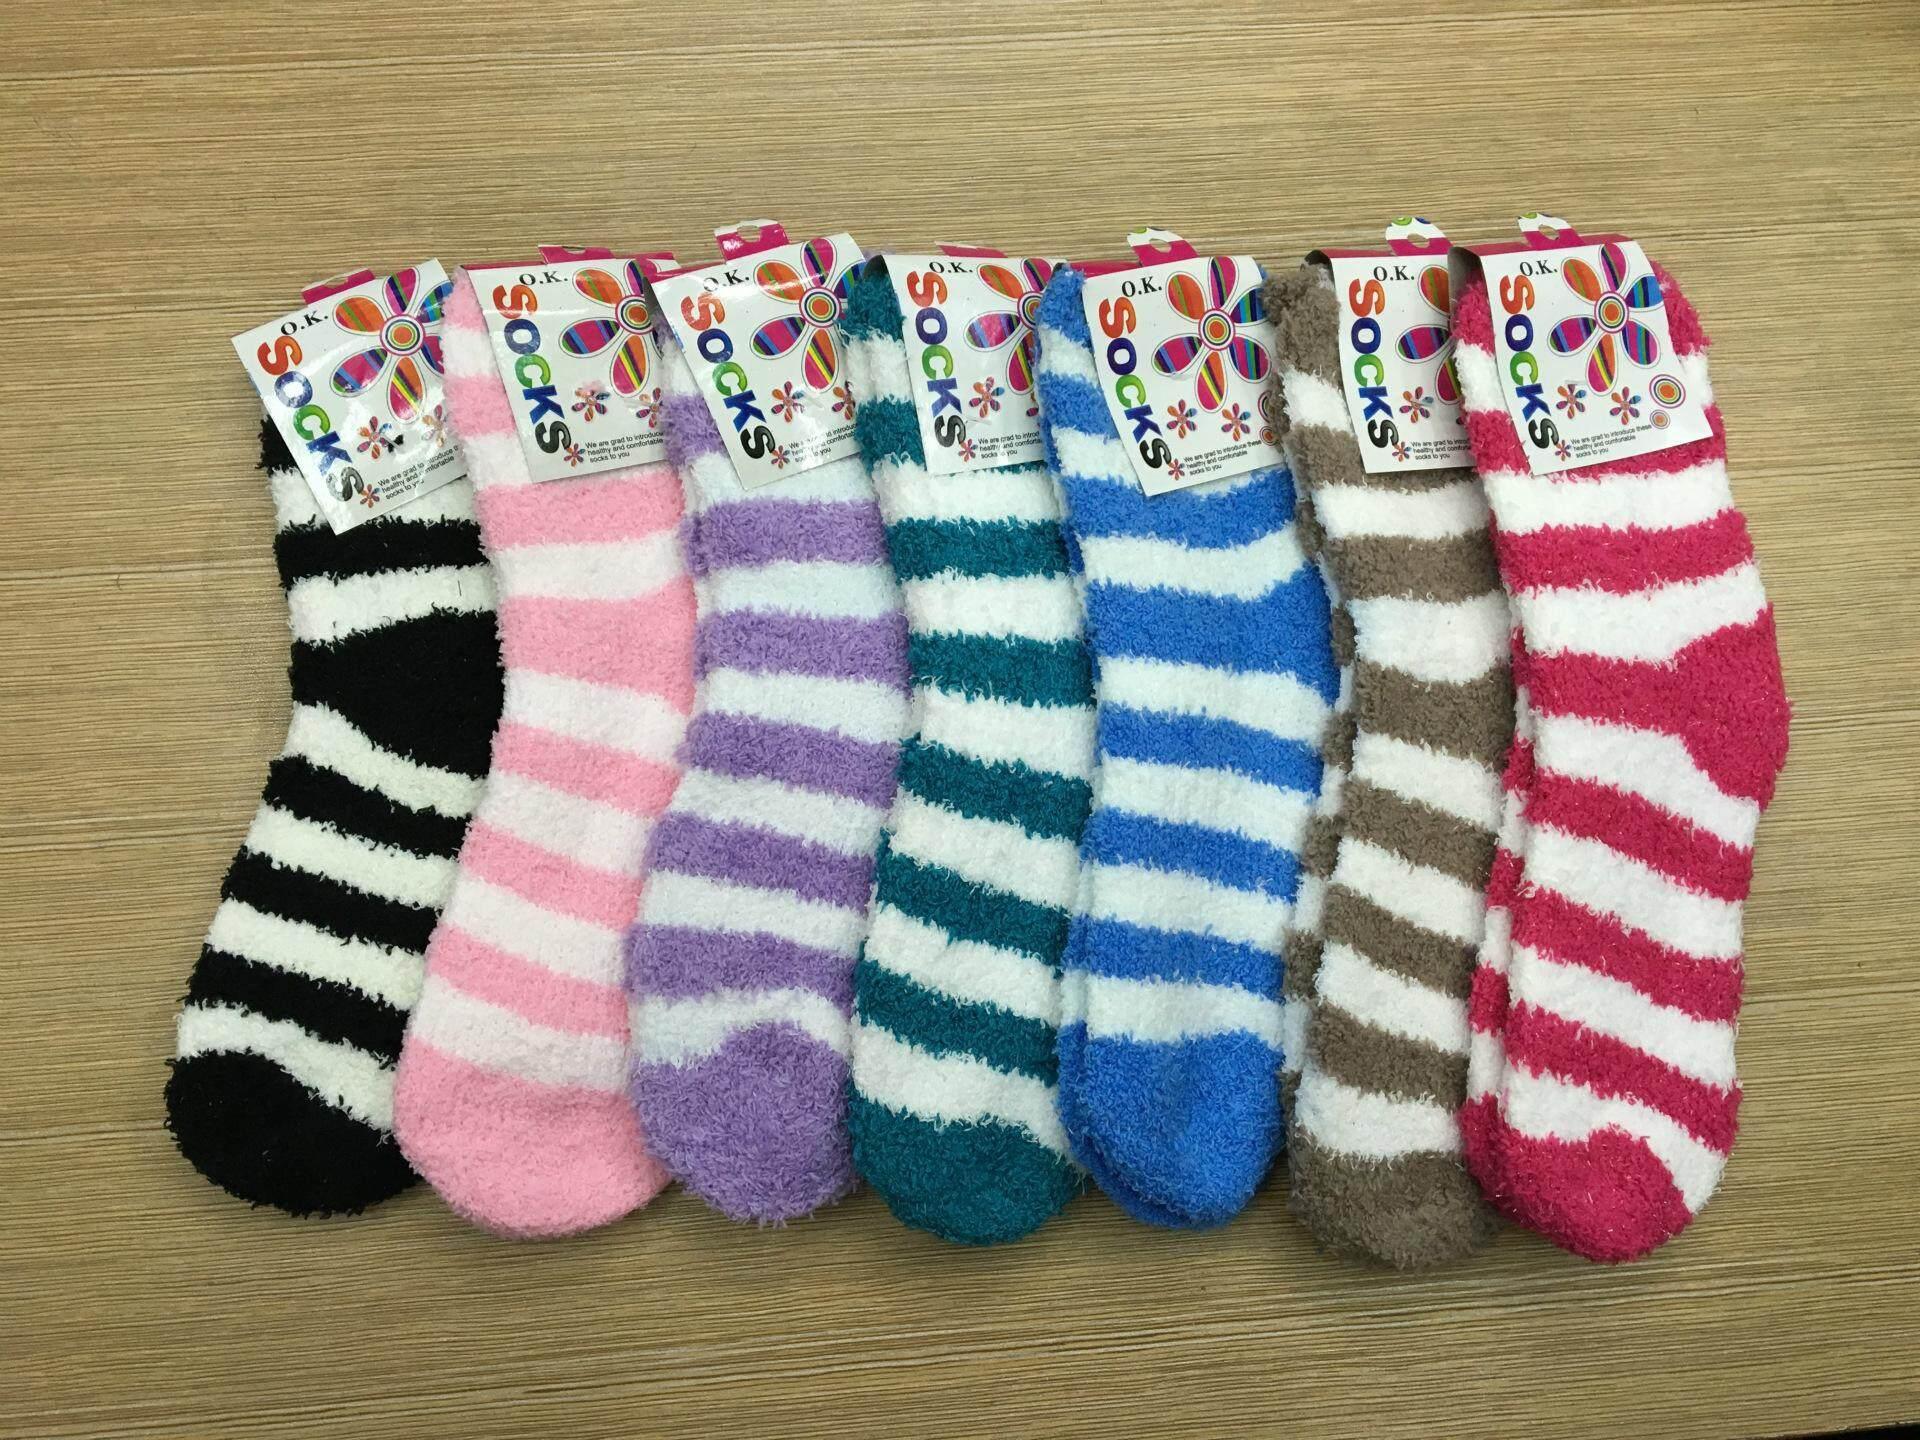 Combo 3 Pairs Confinement Socks Stokin Pantang Bulu Lembut Fur Plain Zebra By Myheart Shoppe.